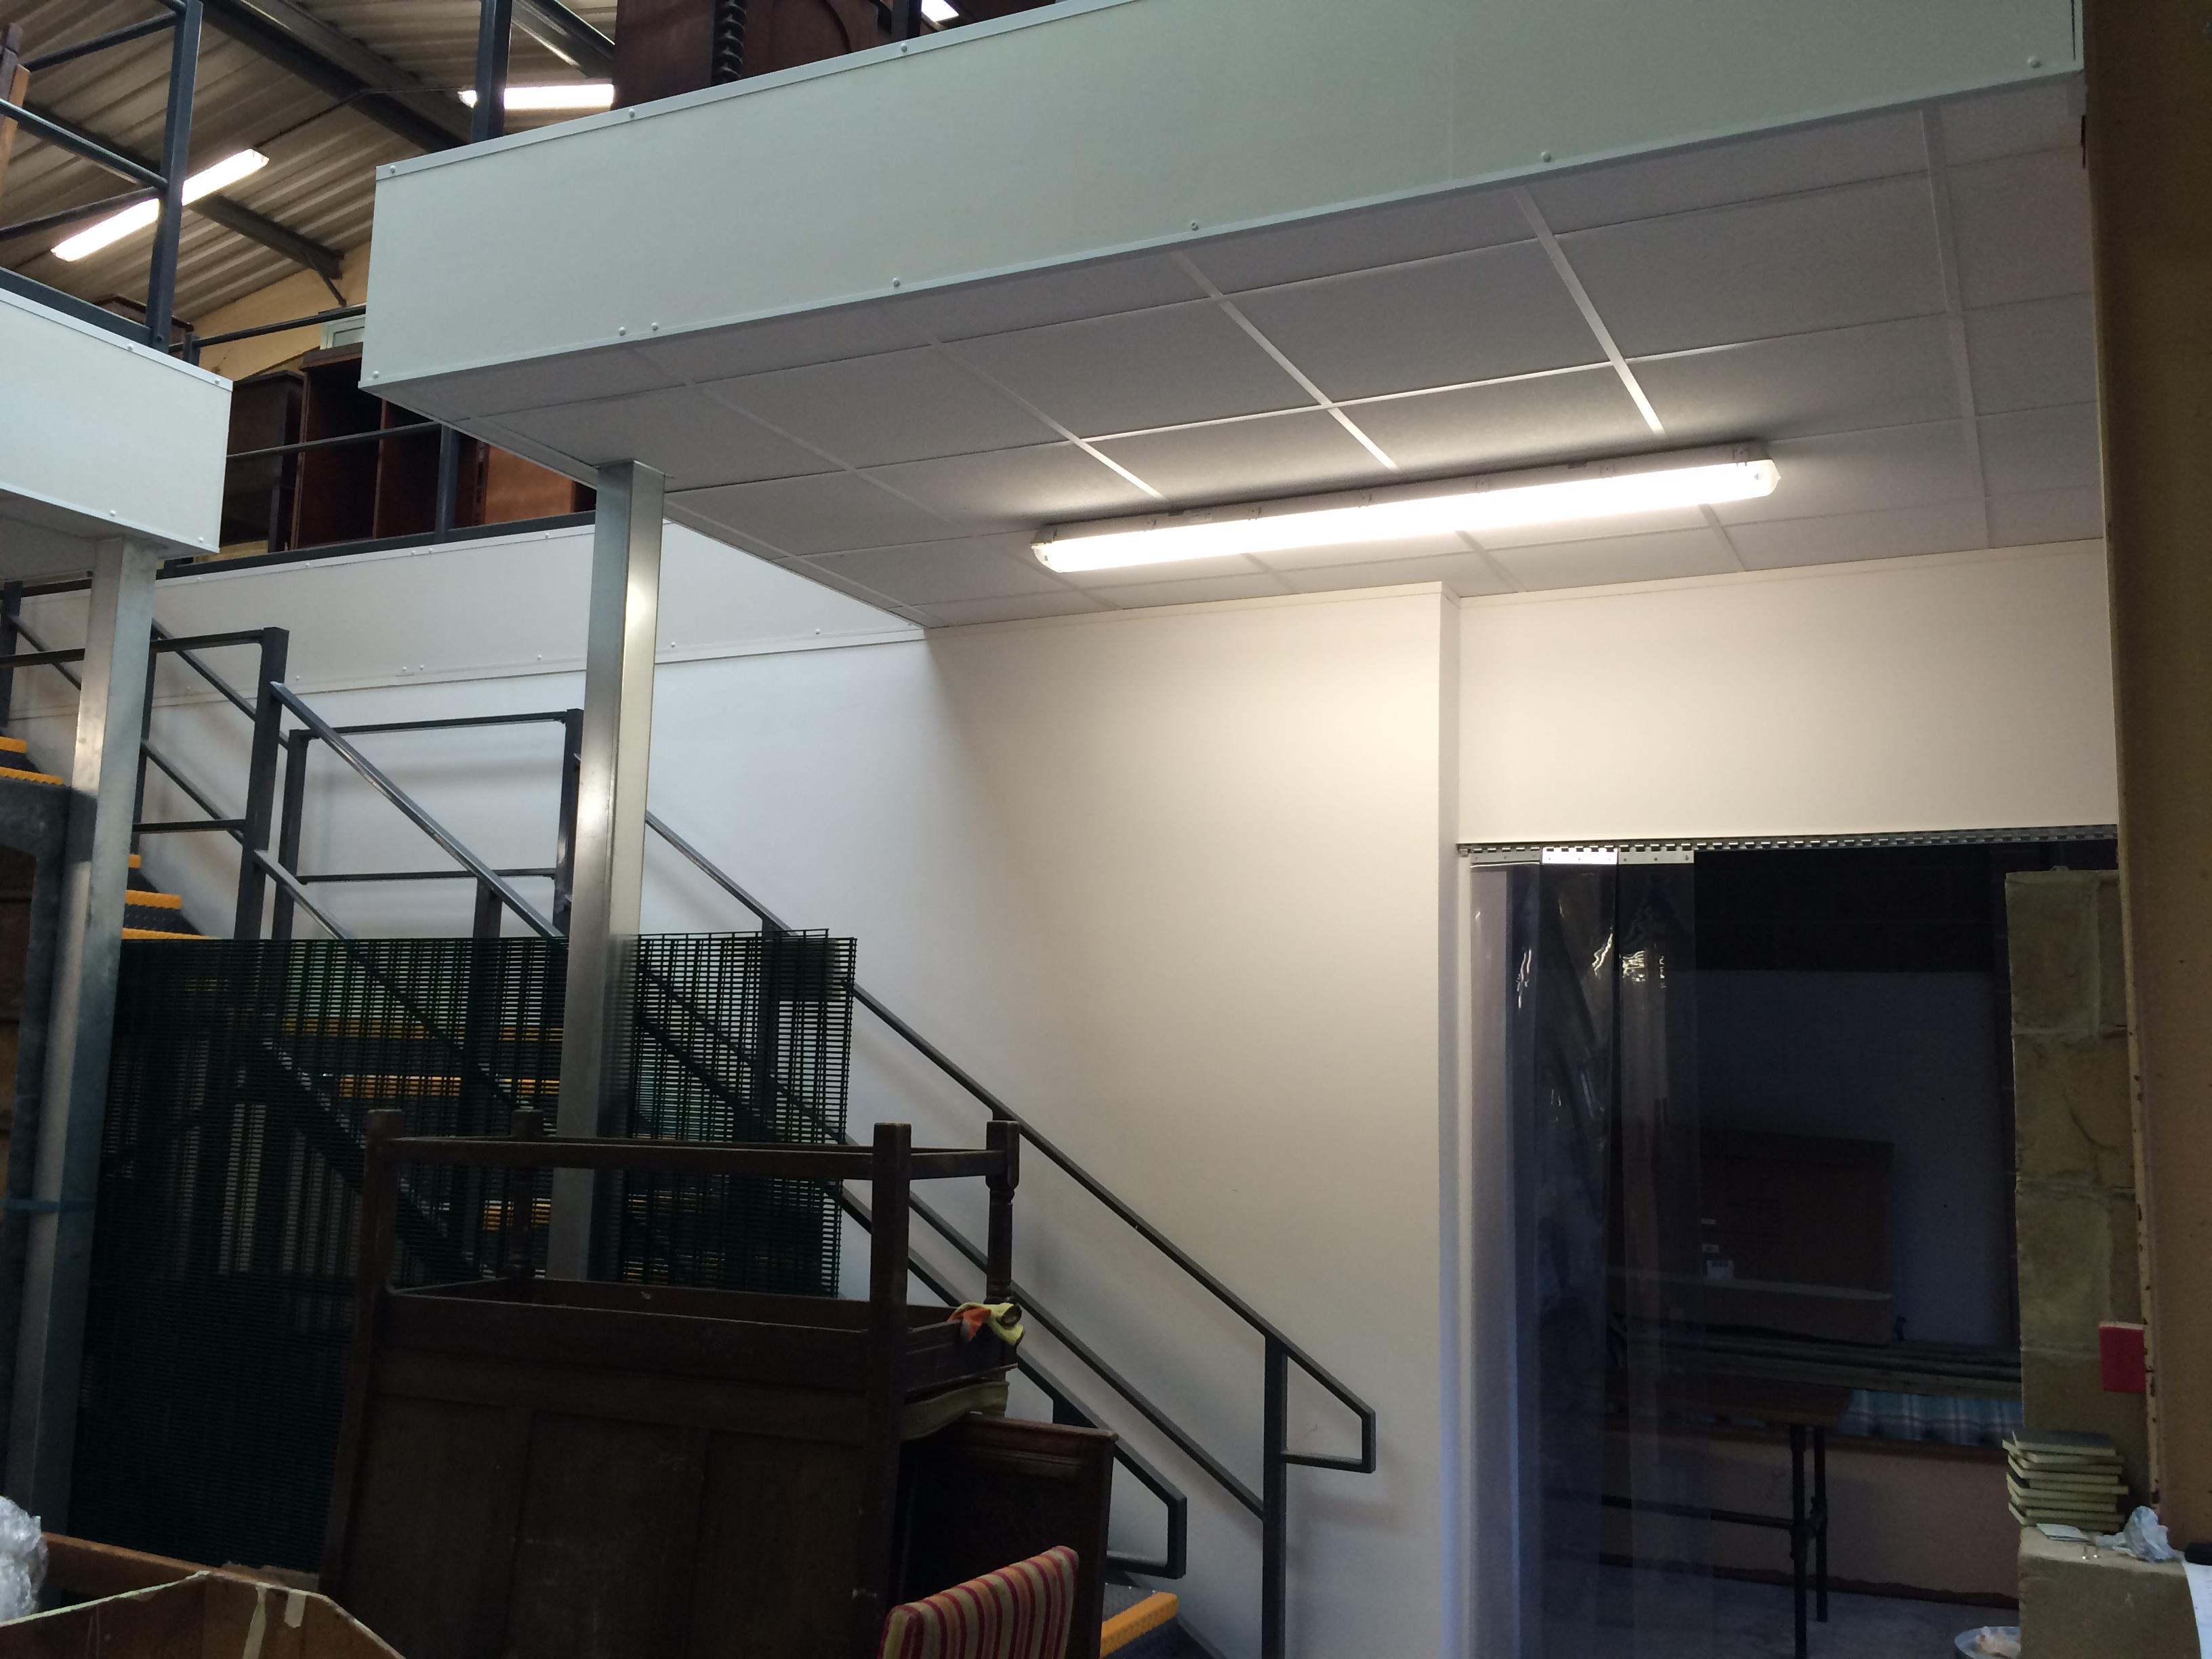 Inn Gear mezzanine floor construction